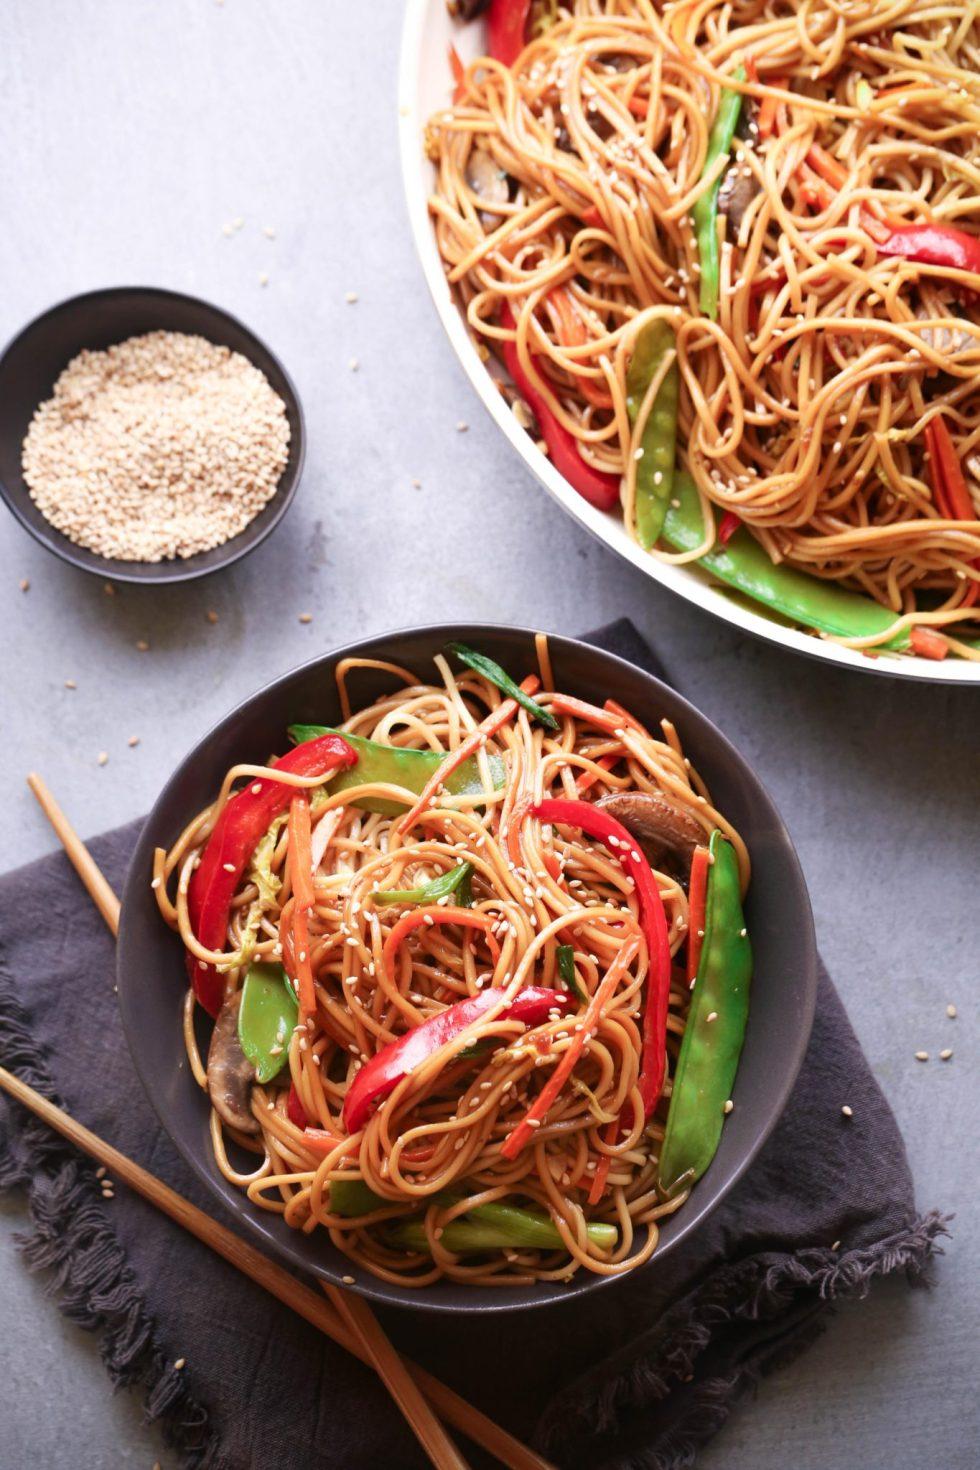 Teriyaki Veggie & Noodle Stir-Fry | Gluten, Dairy, and Egg Free